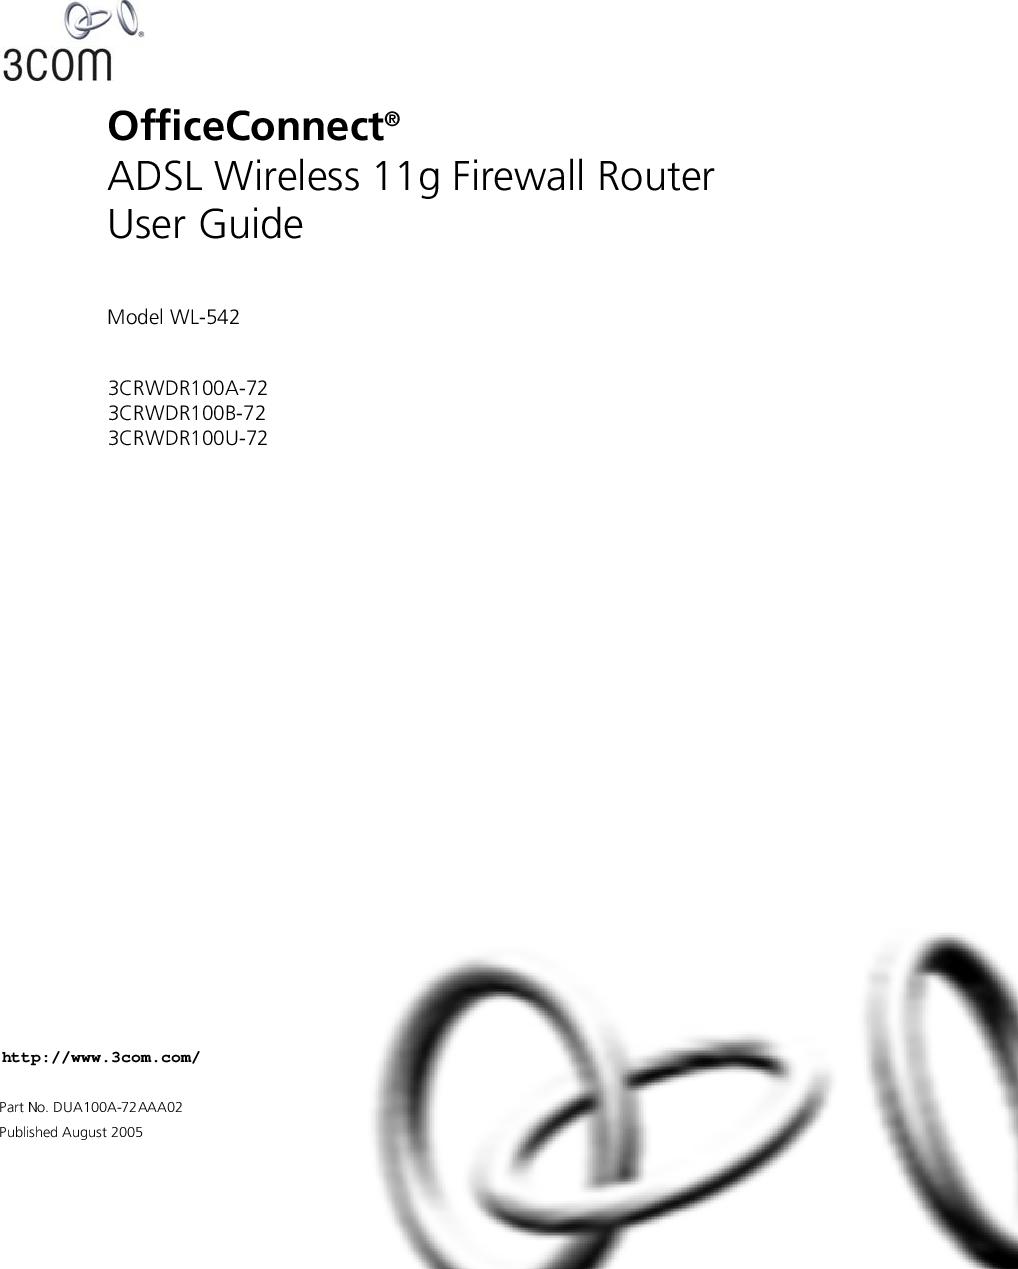 3Com WL 542 3Com® OfficeConnect® ADSL Wireless 11g